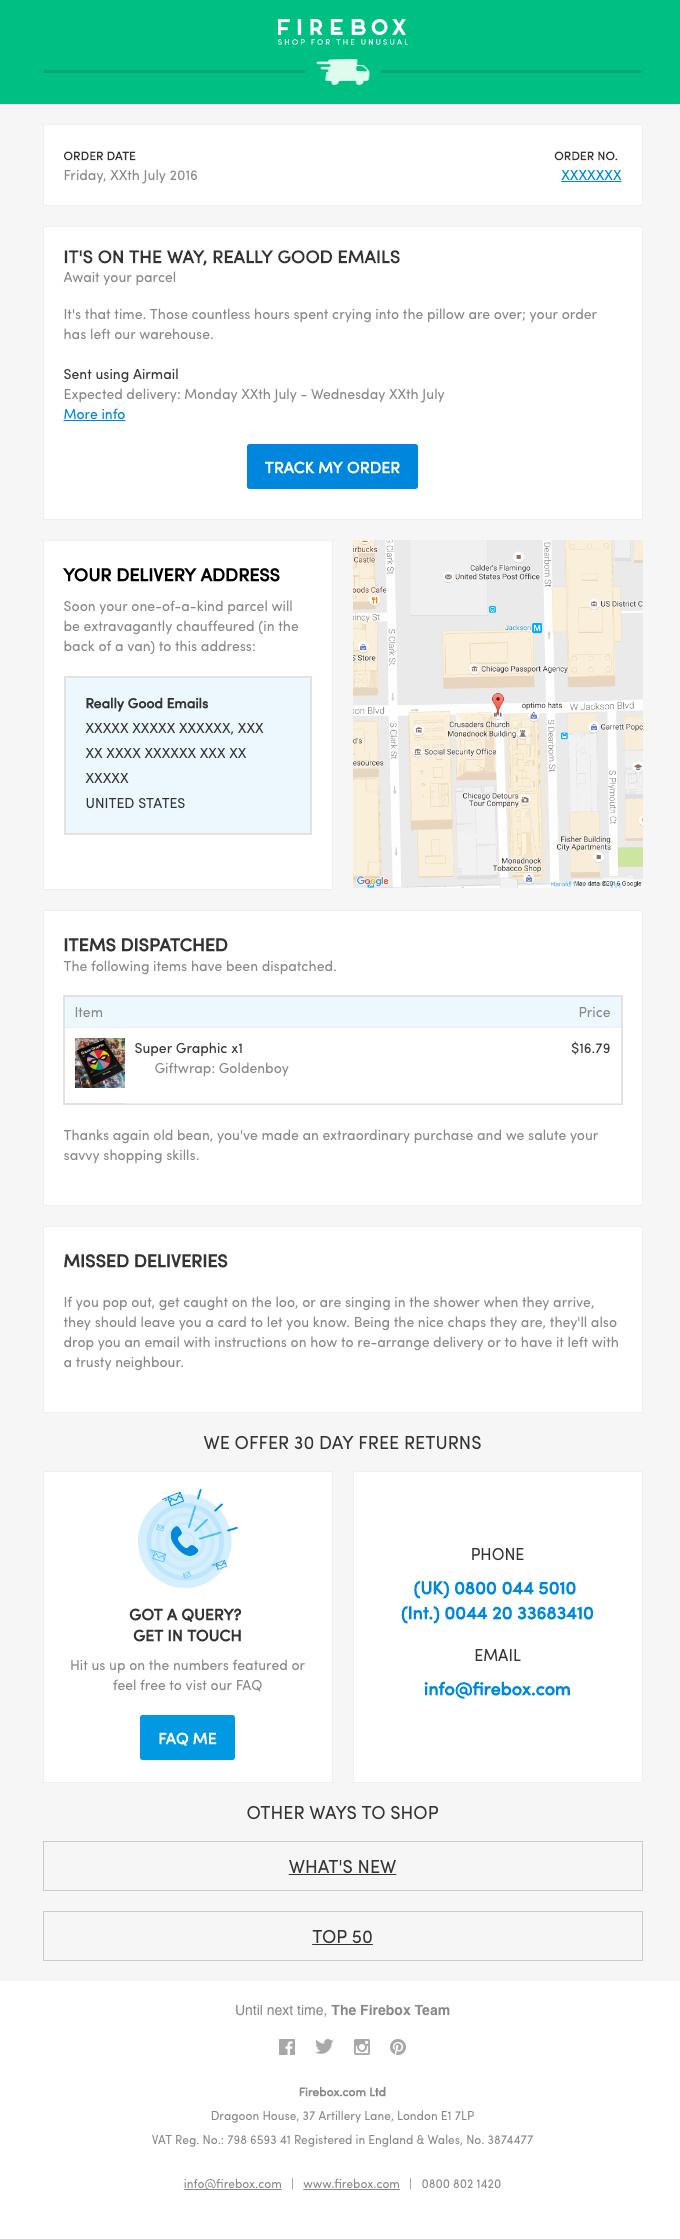 Your Firebox.com order (#XXXXXXX) has been dispatched